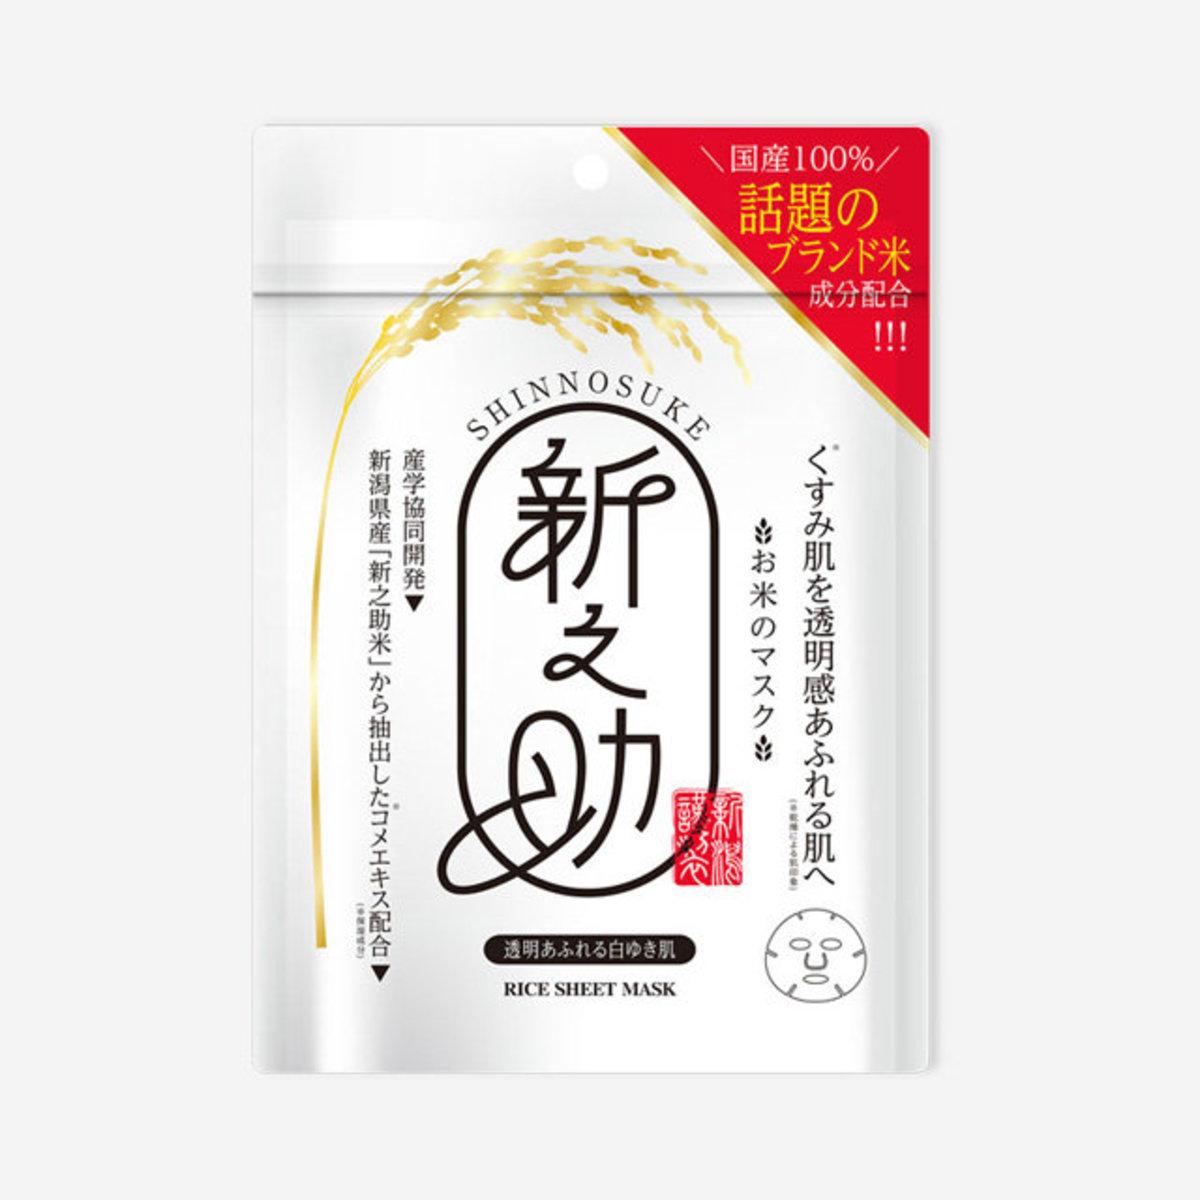 Shinnosuke - Japan Rice Essence Facial Mask( White) (10 sheets) 【Parallel Import Product】